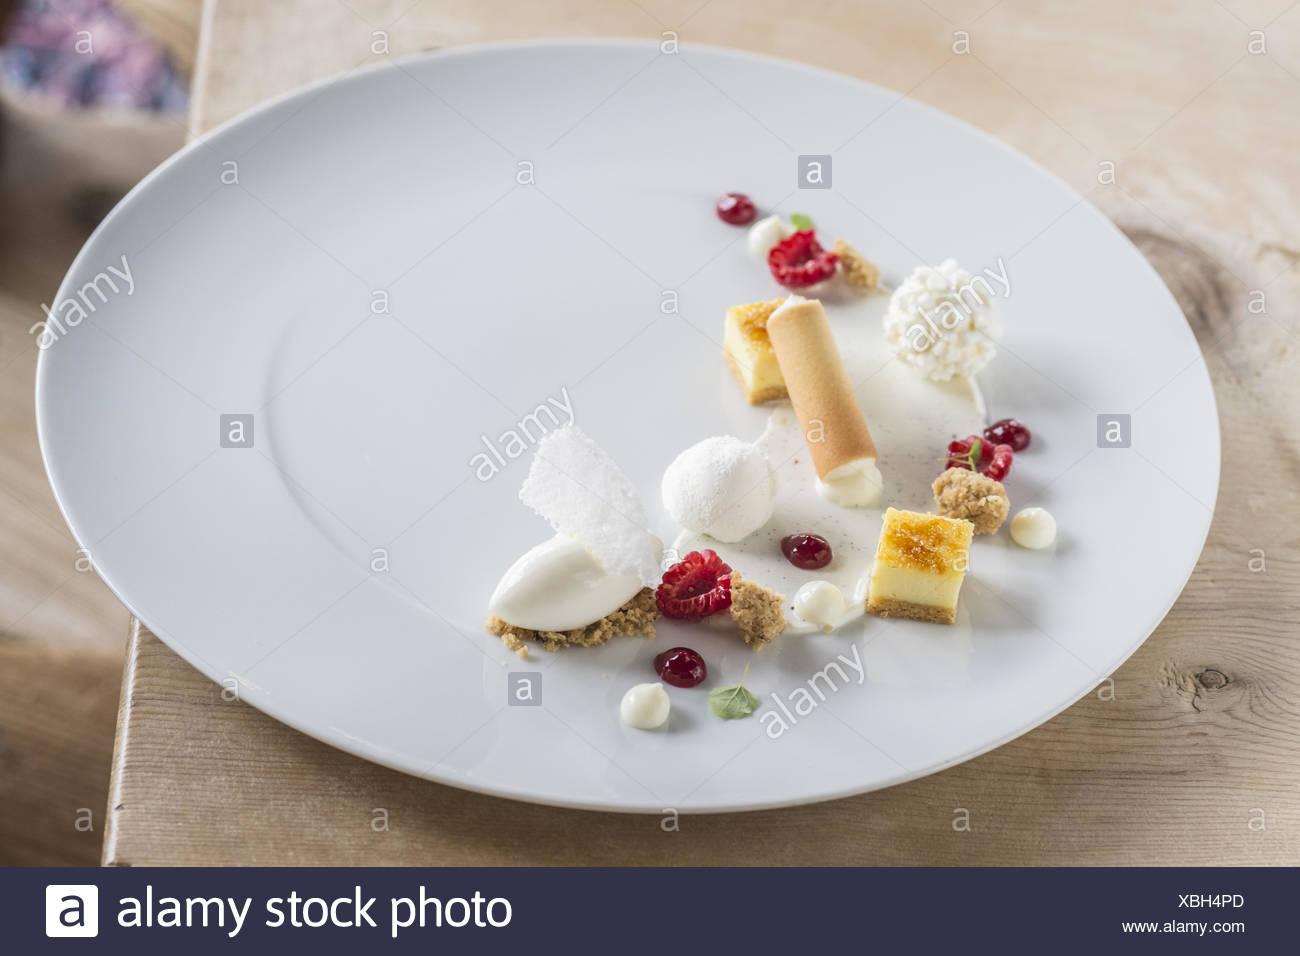 Food Plate Decoration Austria Stock Photo 282504053 Alamy